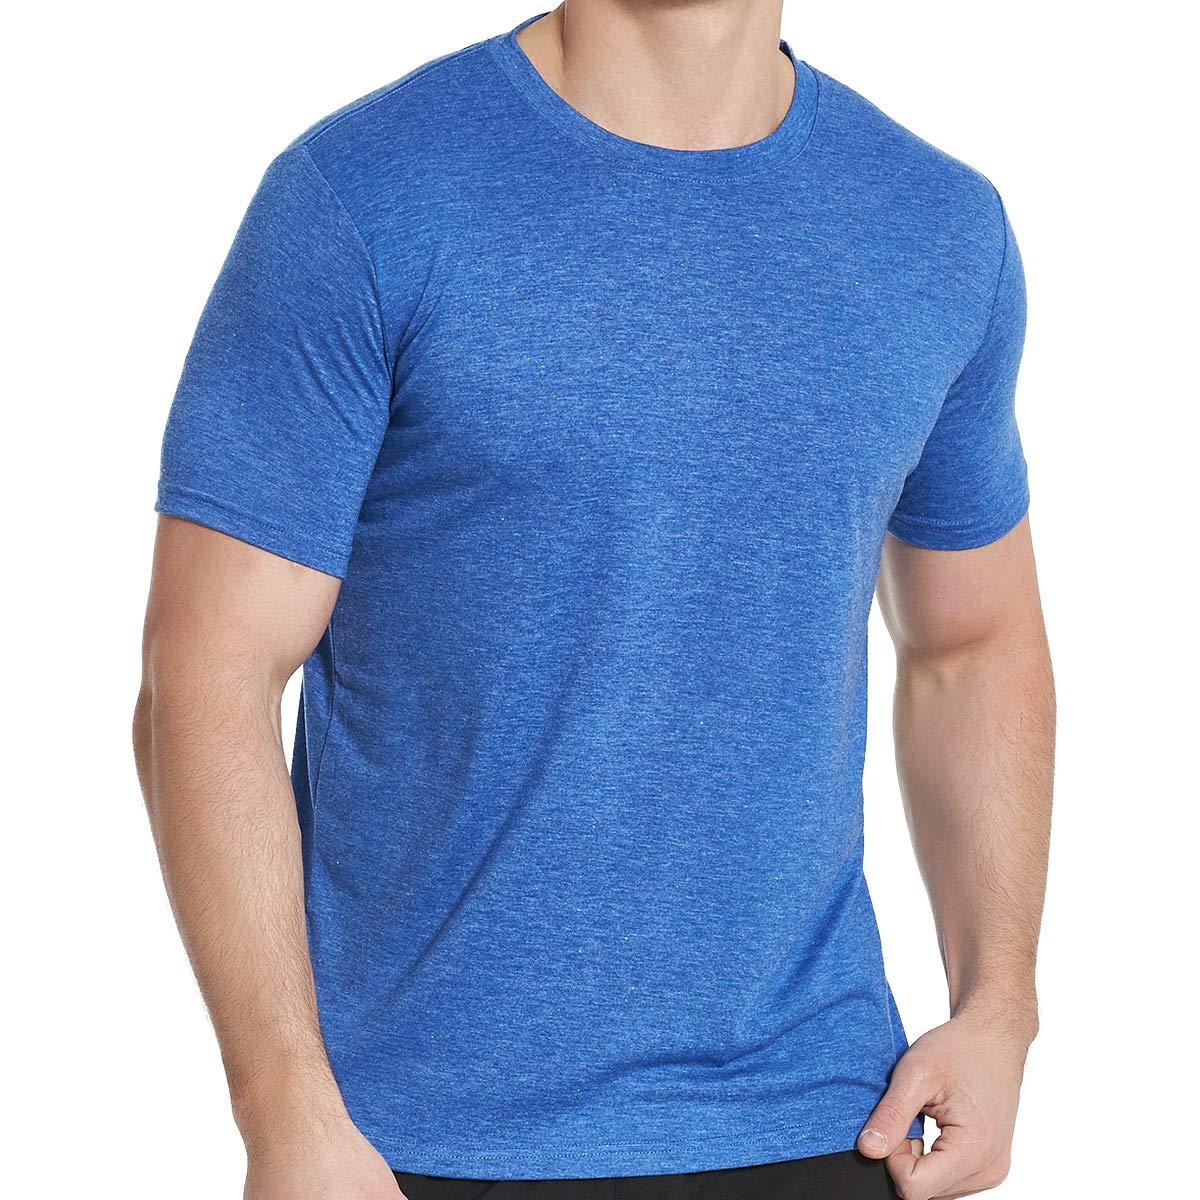 Men's Cotton Athletic T-Shirts, Short Sleeve Crew Neck Workout Tees, Blue XXL